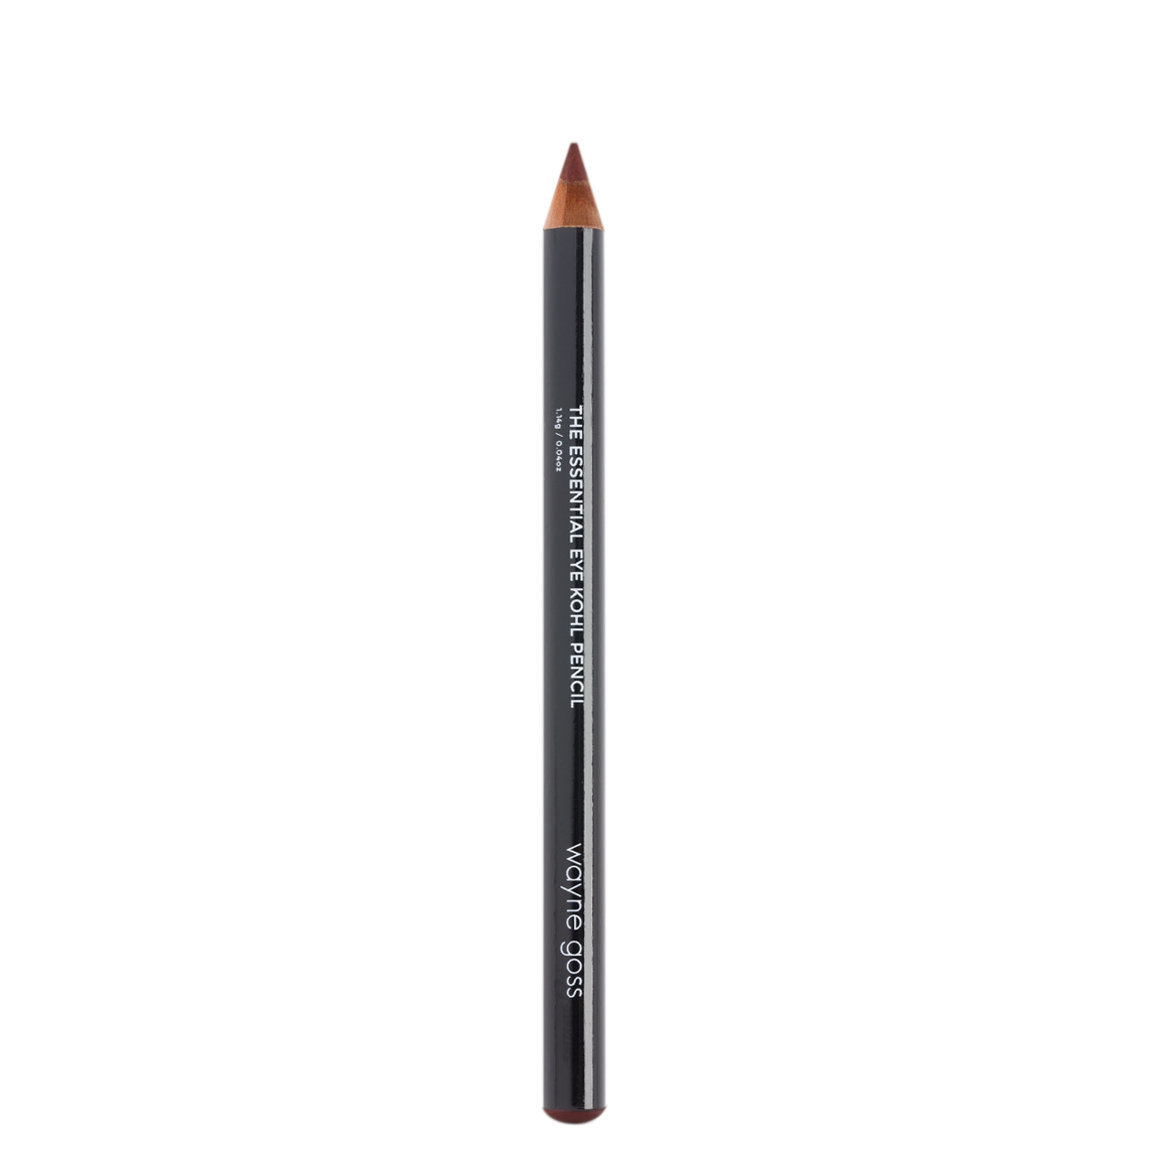 Wayne Goss The Essential Eye Kohl Pencil Copper Flame alternative view 1.